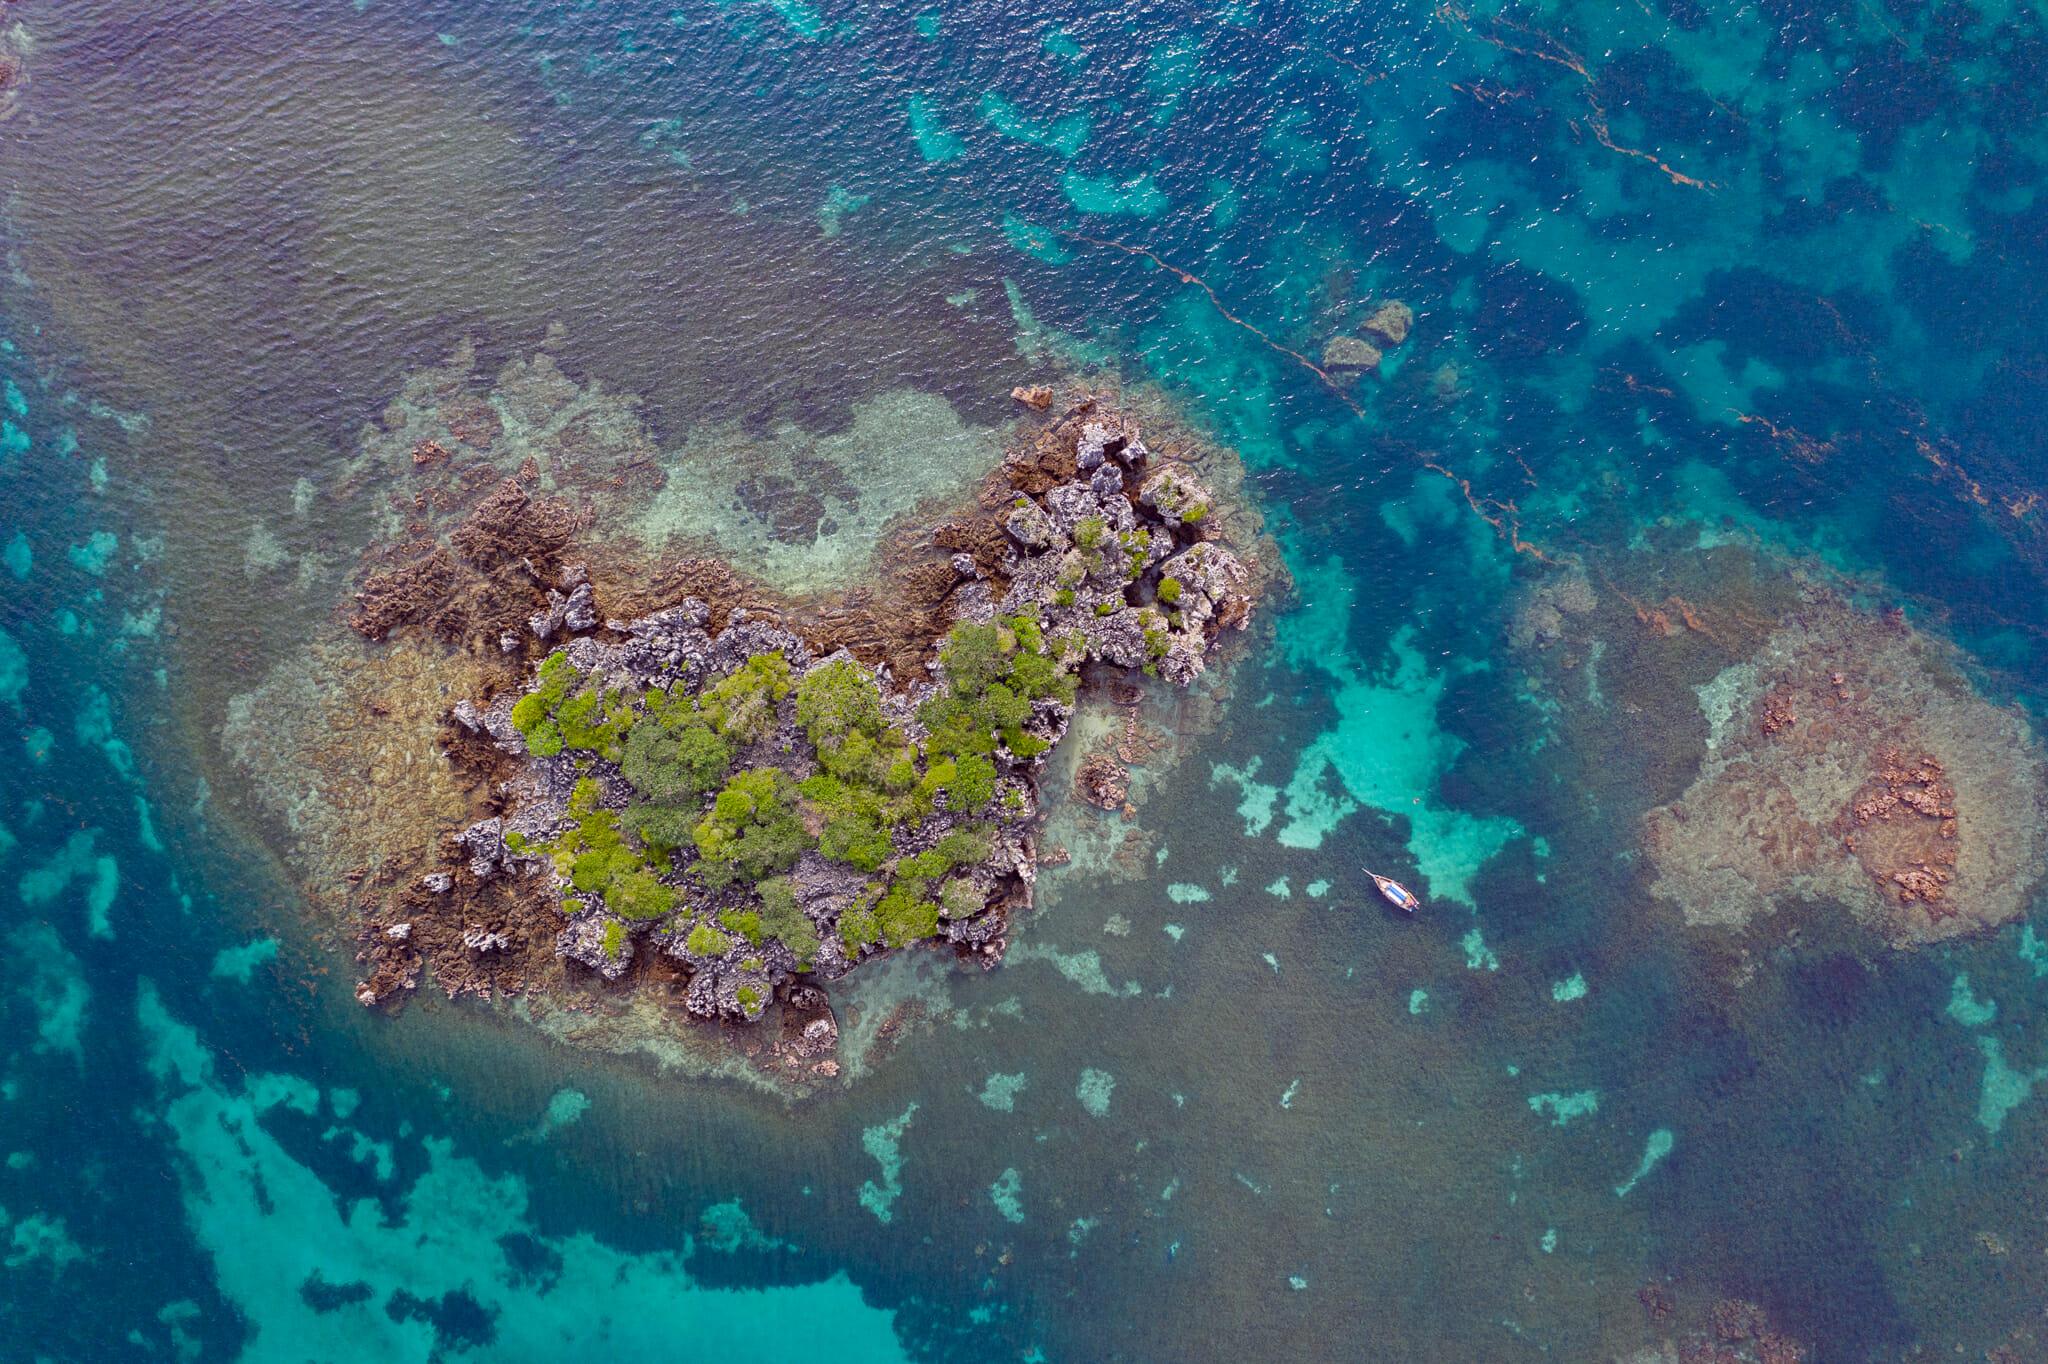 vue de drone sur le corail garden de mafia island